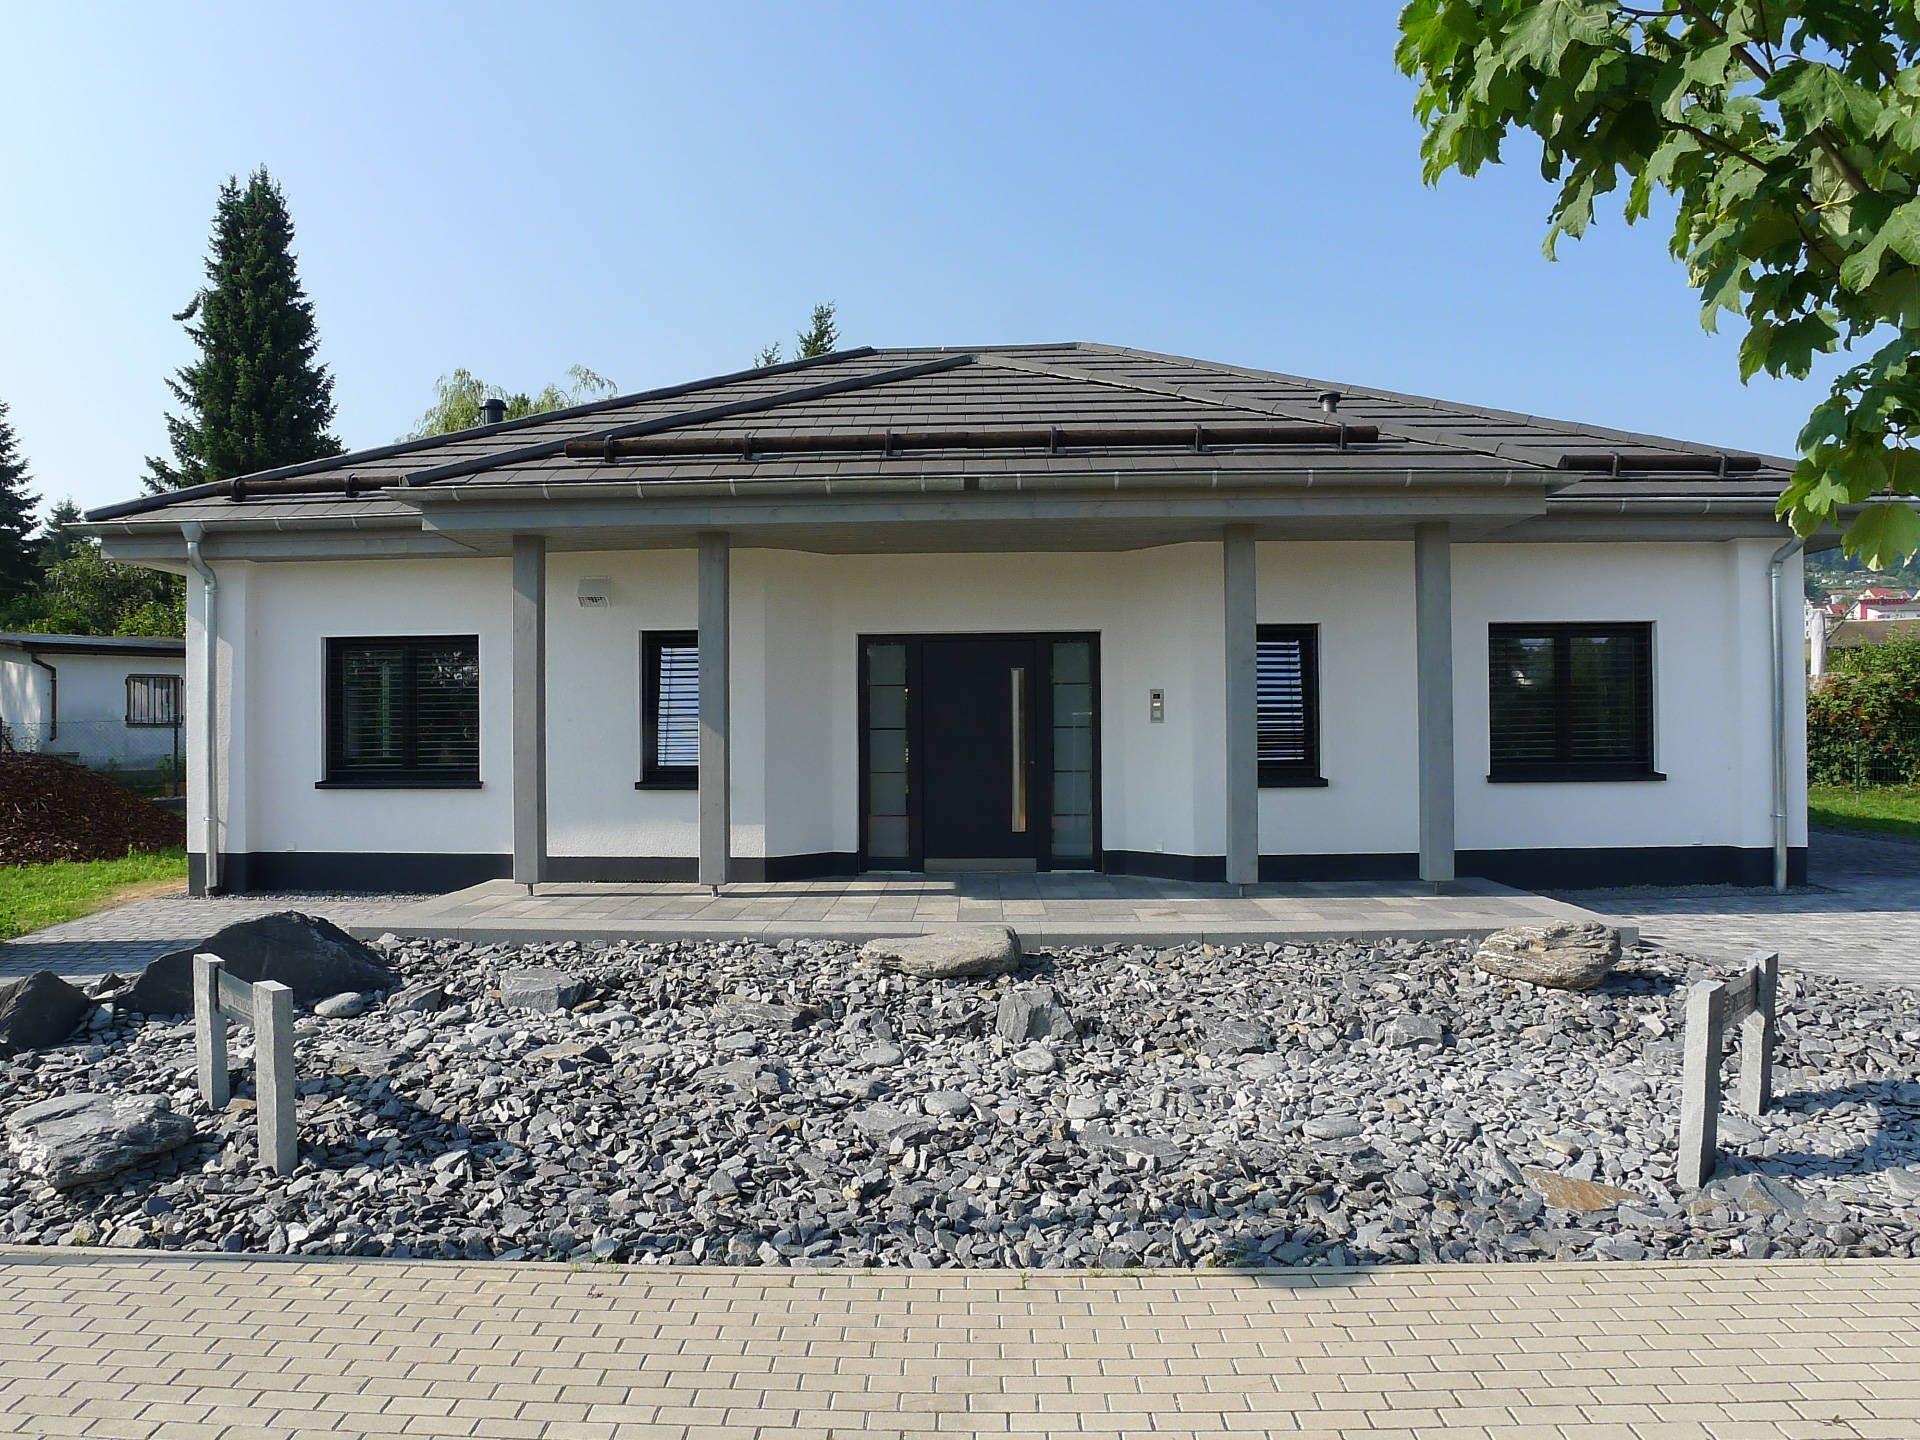 Musterhaus bungalow modern  Musterhaus Ilmenau • Musterhaus von HSE Massivhaus • Individuelles ...